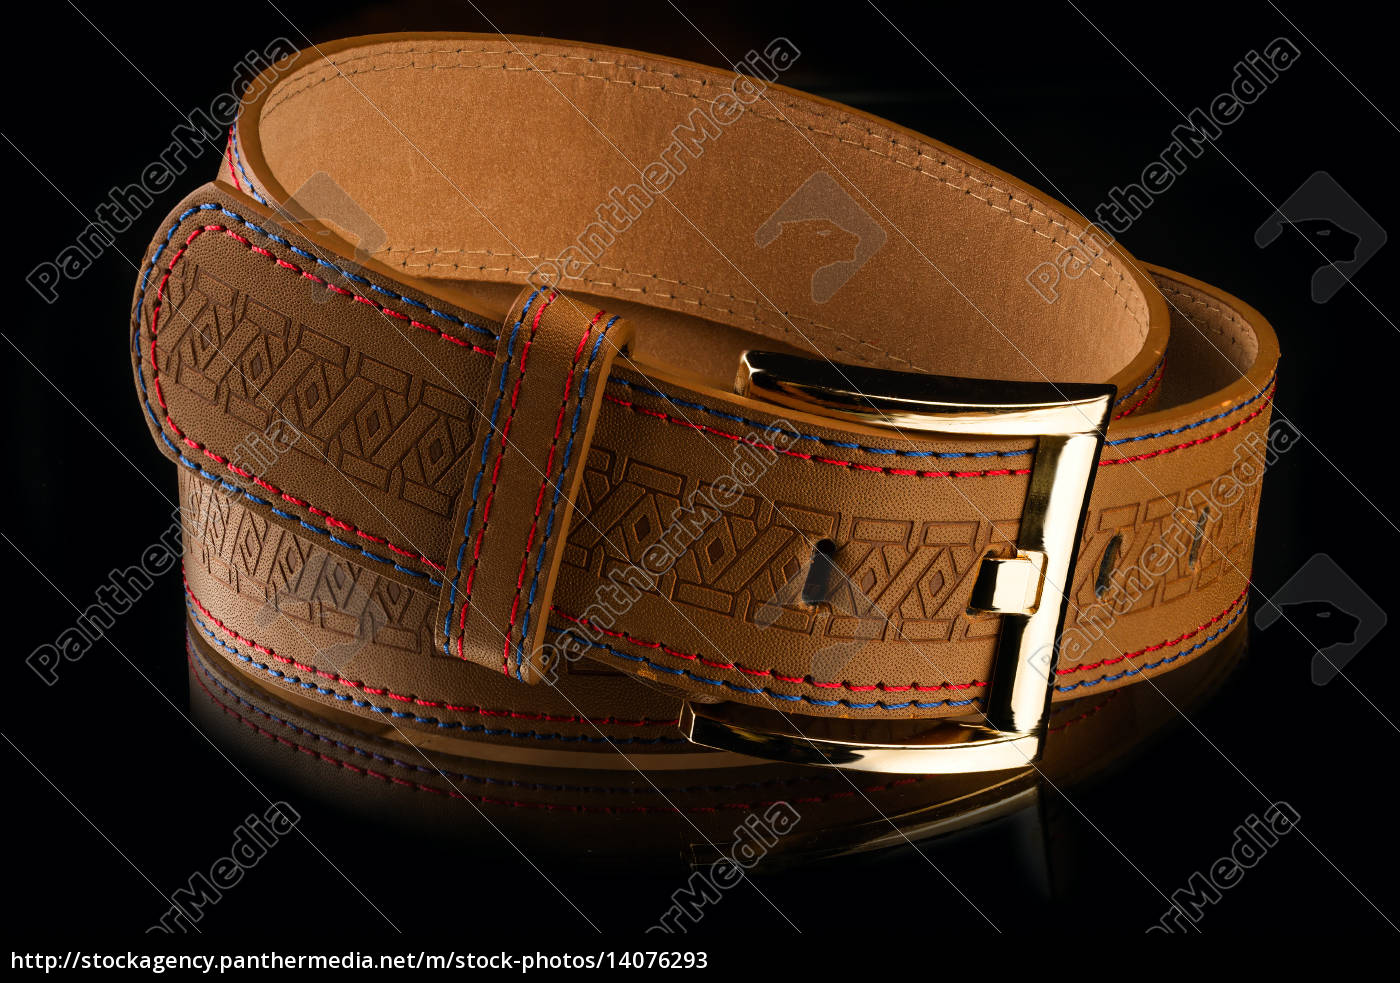 new, stylish, brown, leather, men's, belt - 14076293